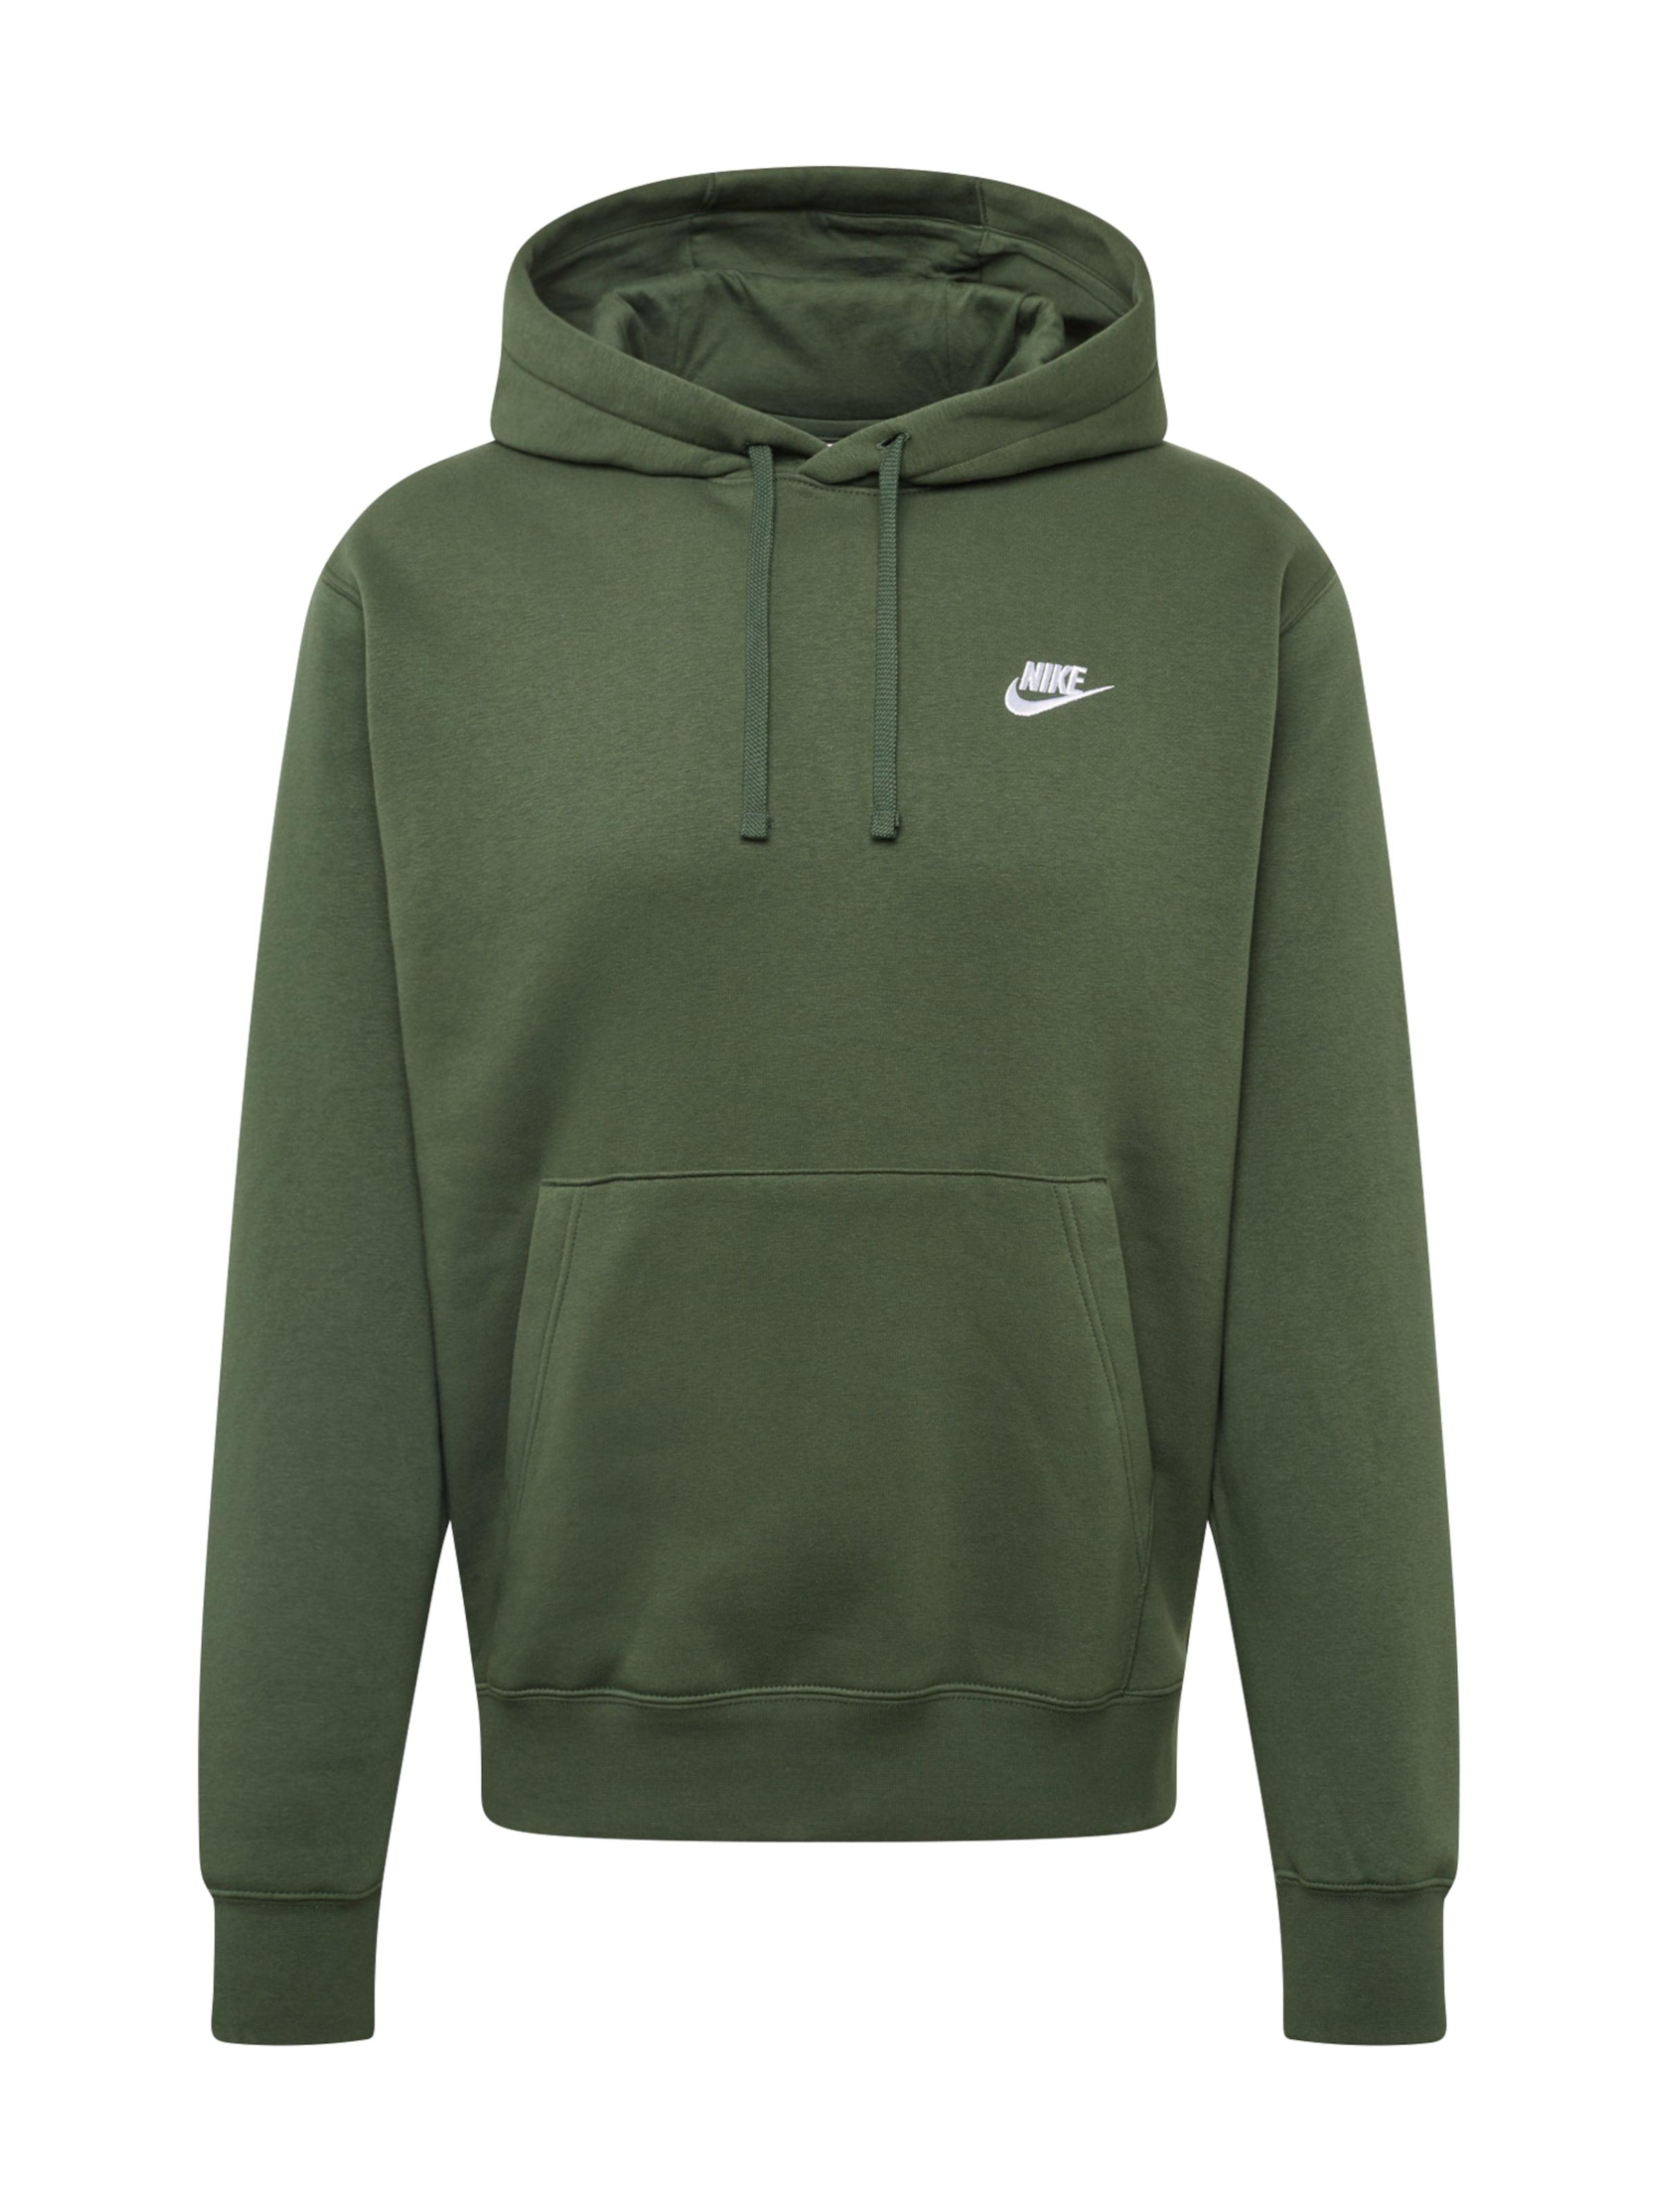 Sweatshirt In Sportswear 'club' Dunkelgrün Nike kXOPiZu